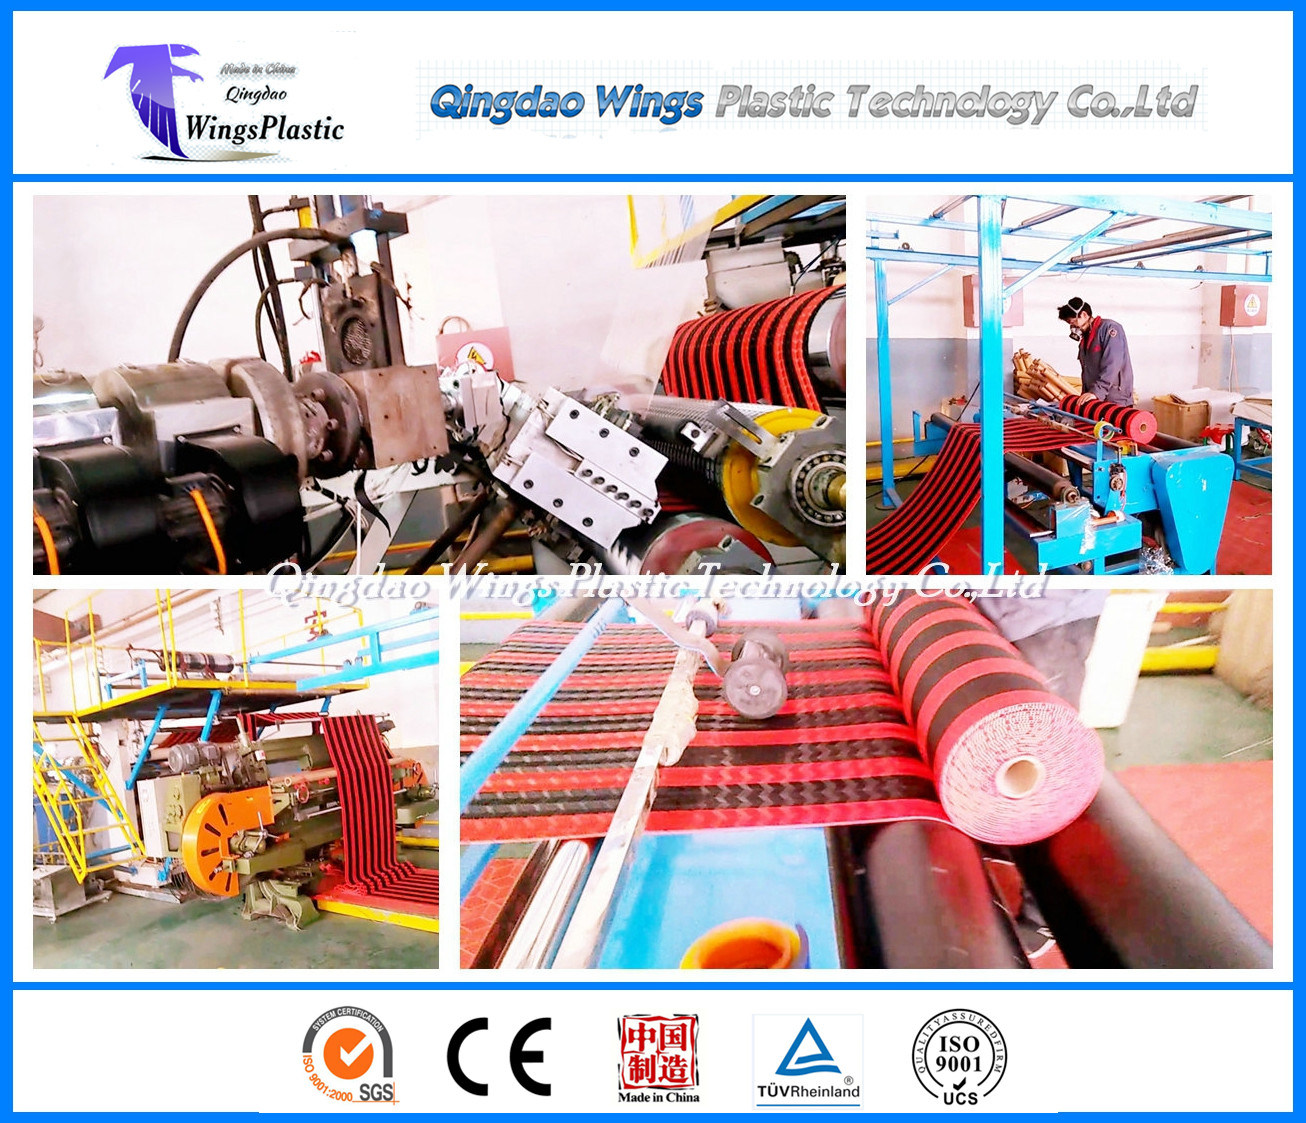 PVC Anti Slip Mat Making Machine / PVC Mat Extrusion Machine / Plastic Mat Production Line